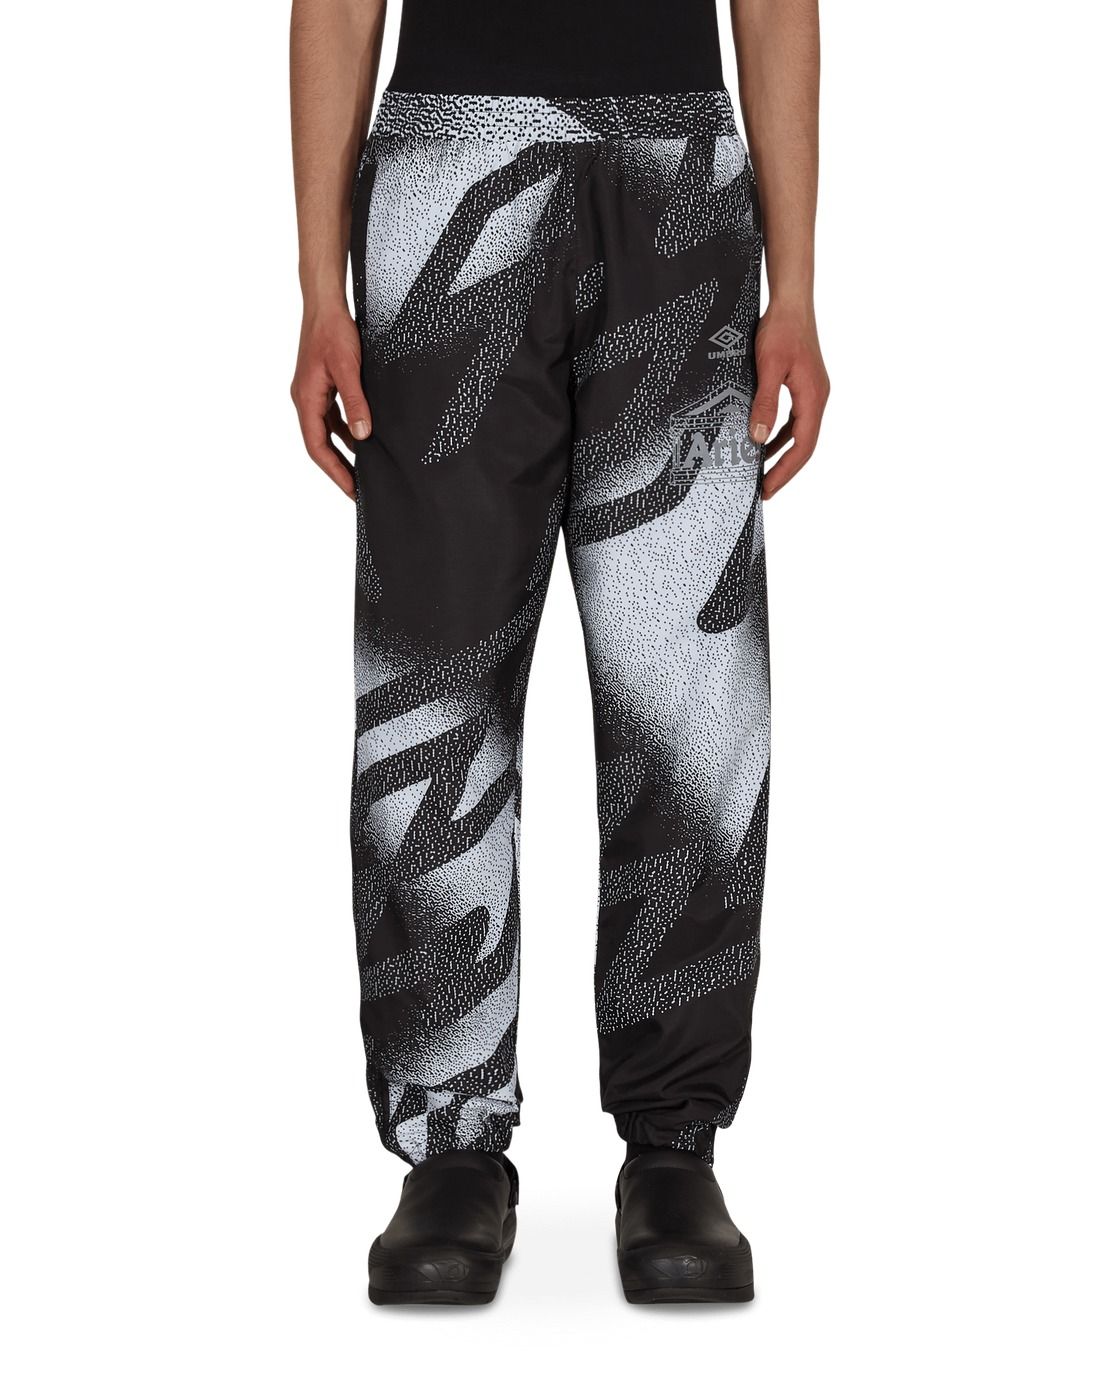 Aries Umbro Training Pants Black/White